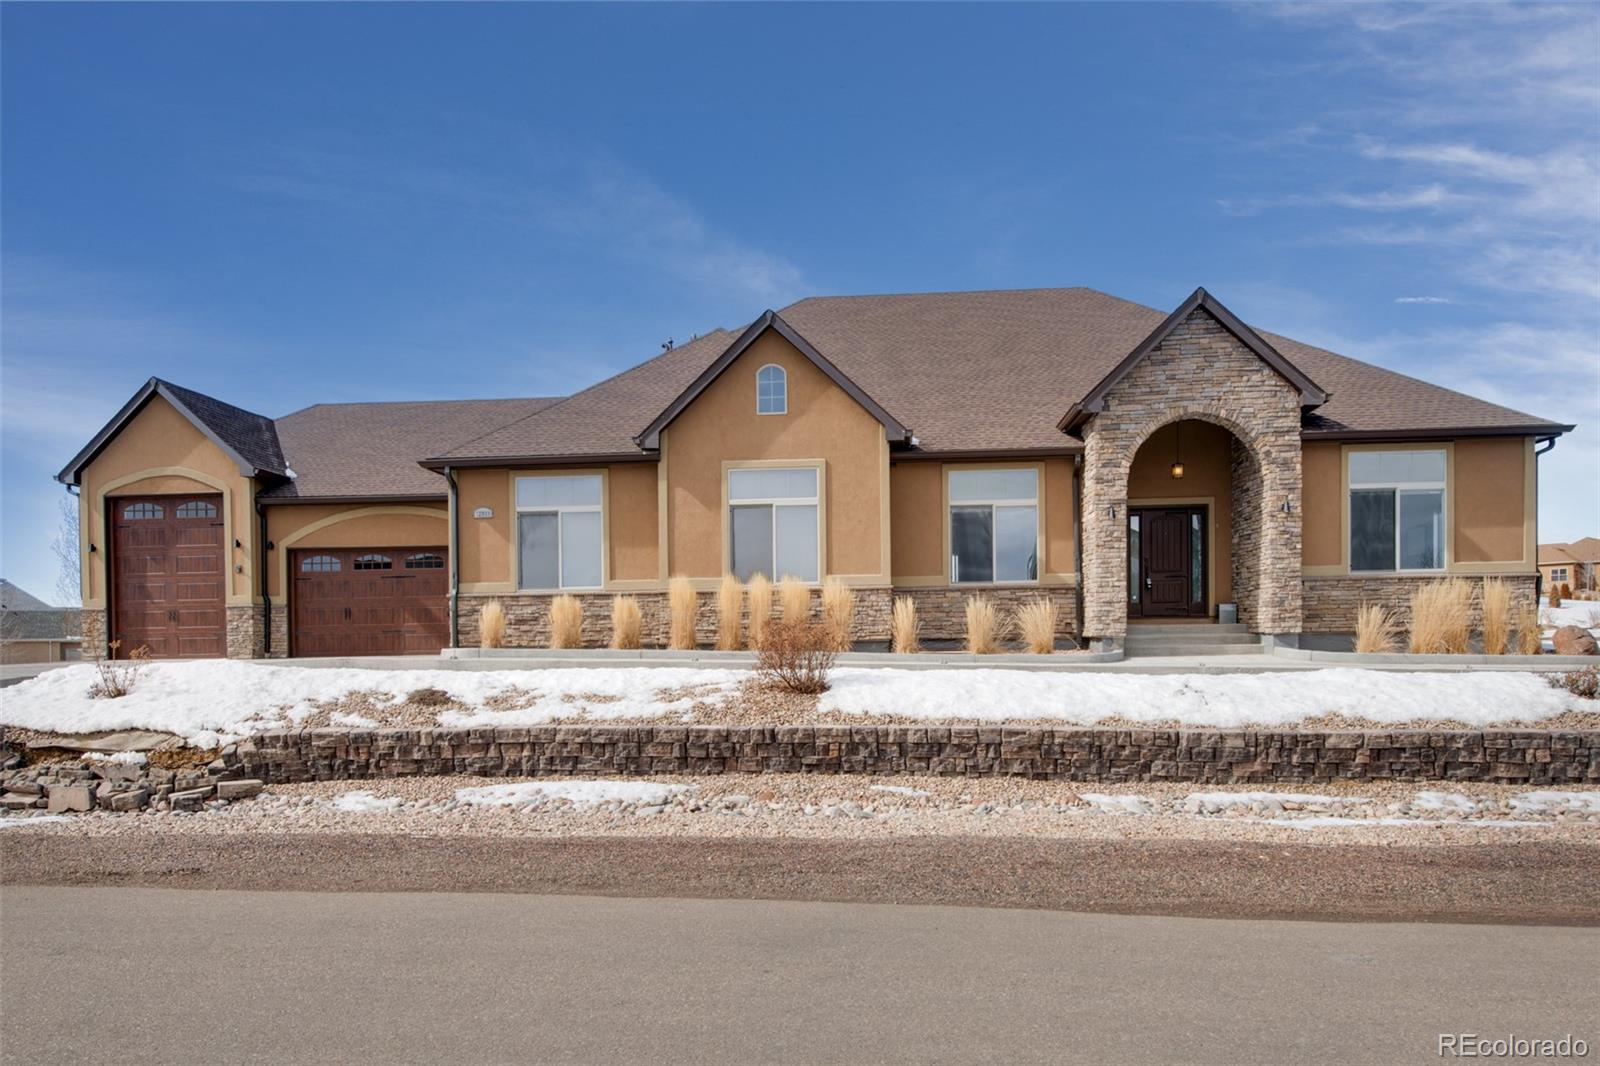 12999 Wabash Court, Thornton, CO 80602 - Thornton, CO real estate listing